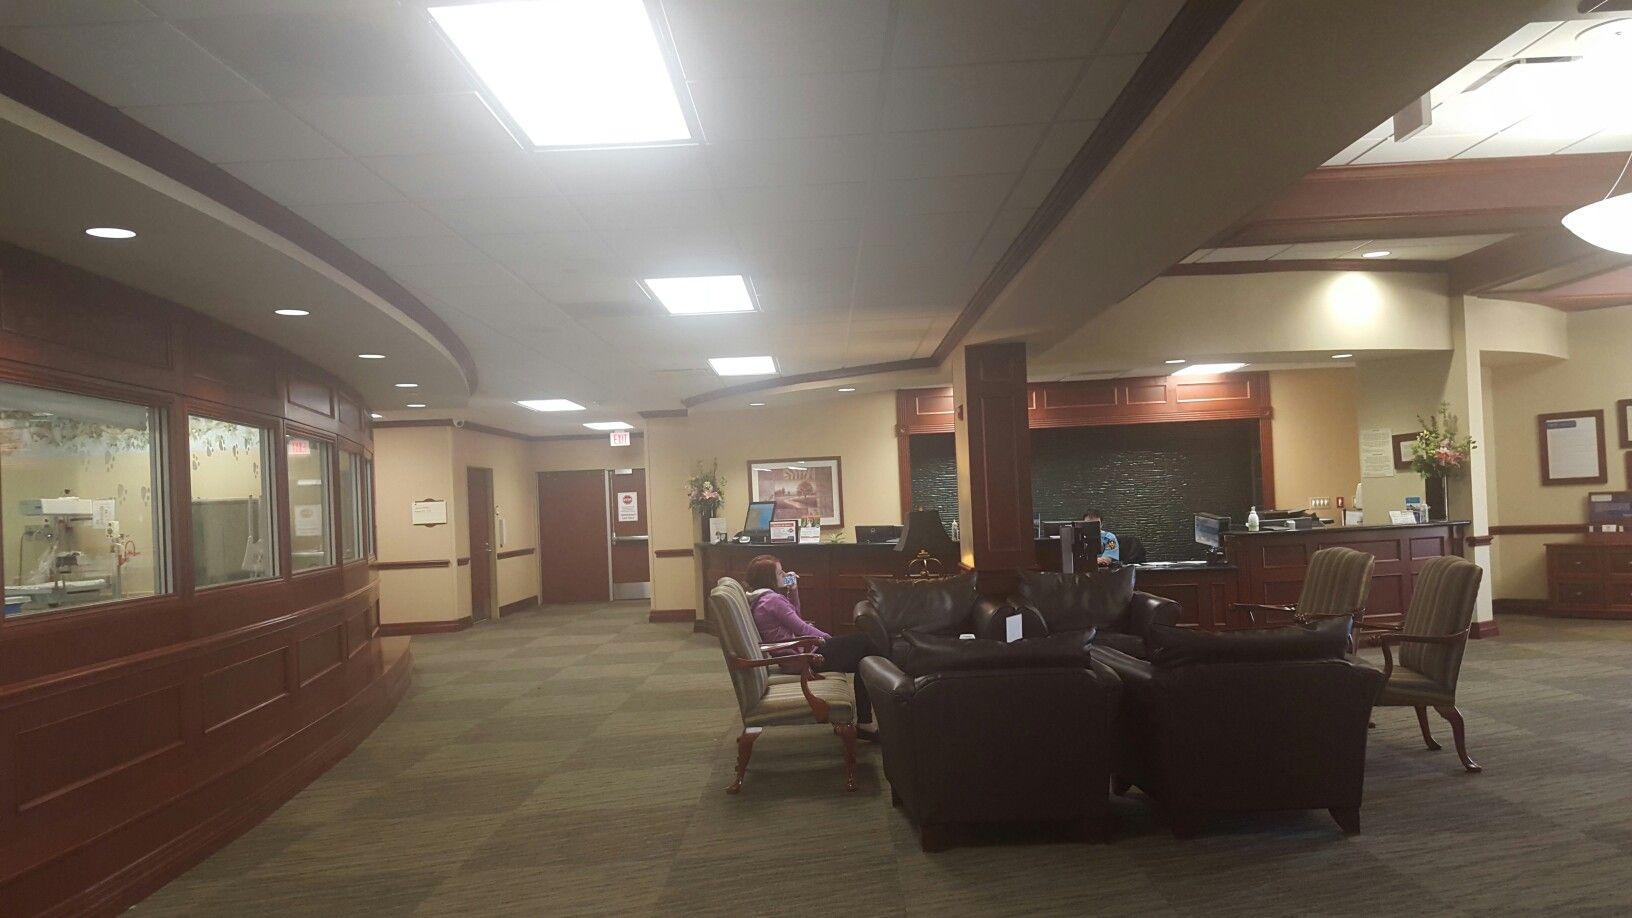 Baylor Scott & White Medical Center in Frisco